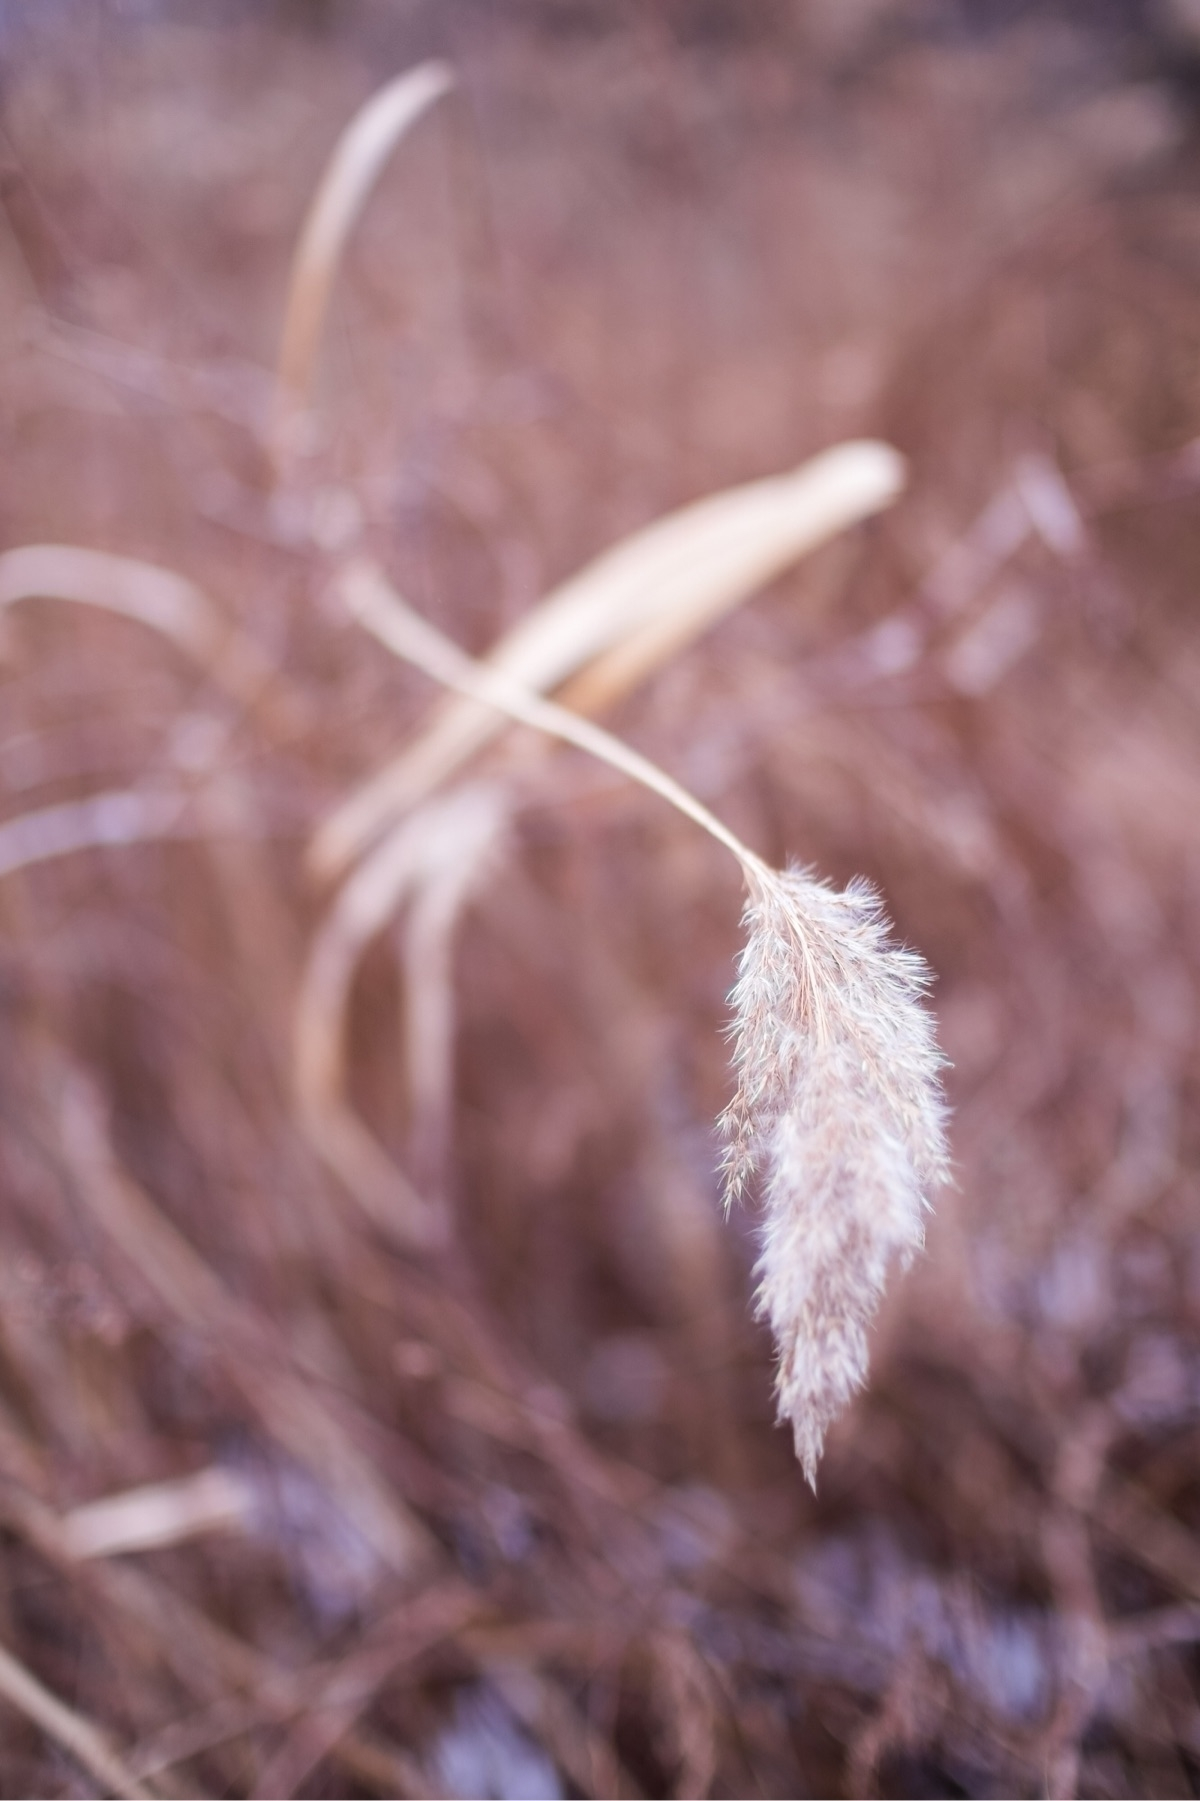 nature, fujifeed, xt20, mitakonzhongyi - ungrammed | ello